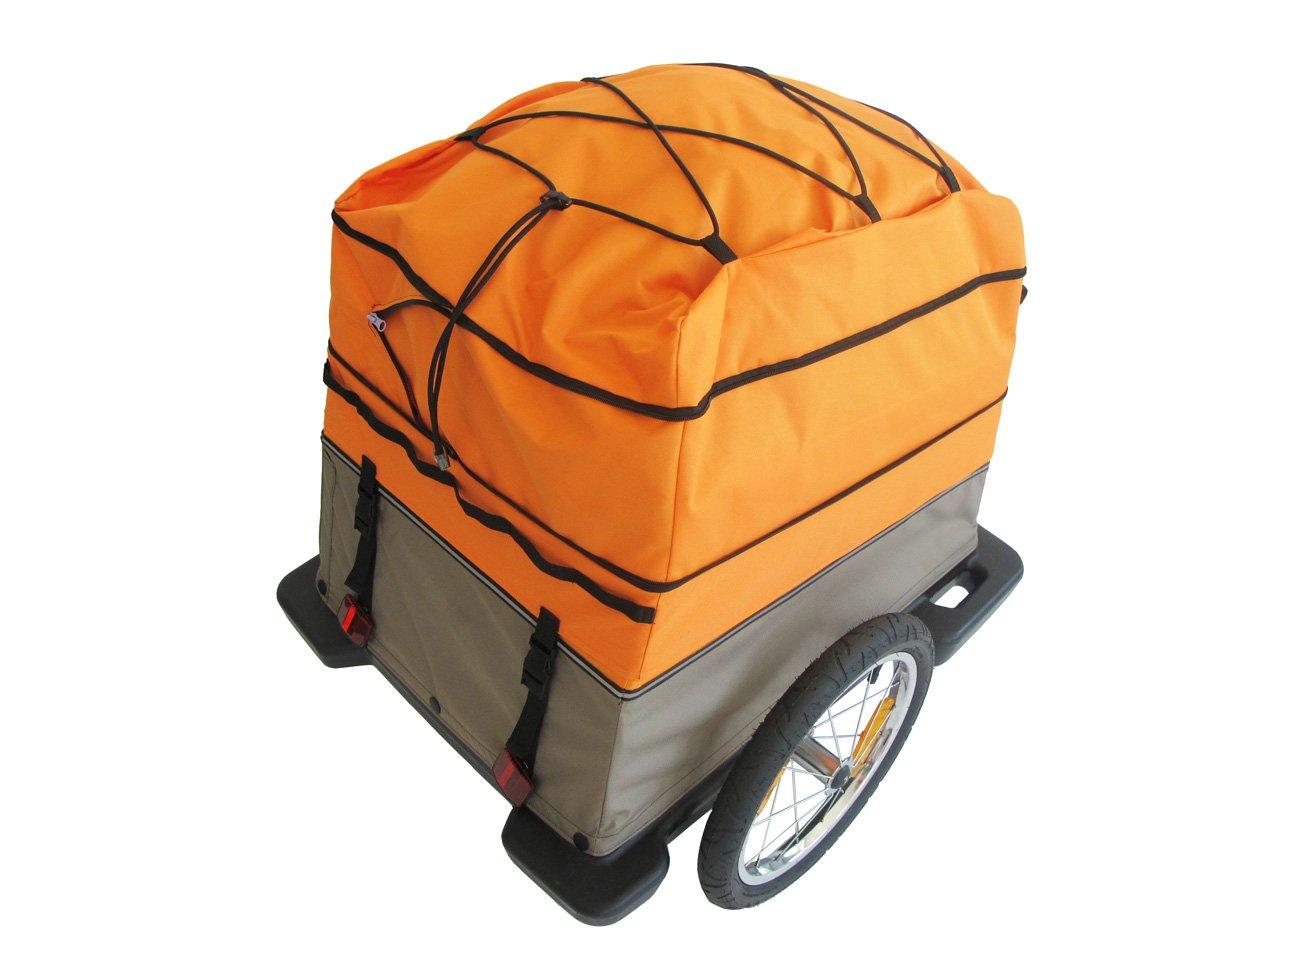 Croozer Cargo Touring Cover for Cargo Bike Trailer Orange